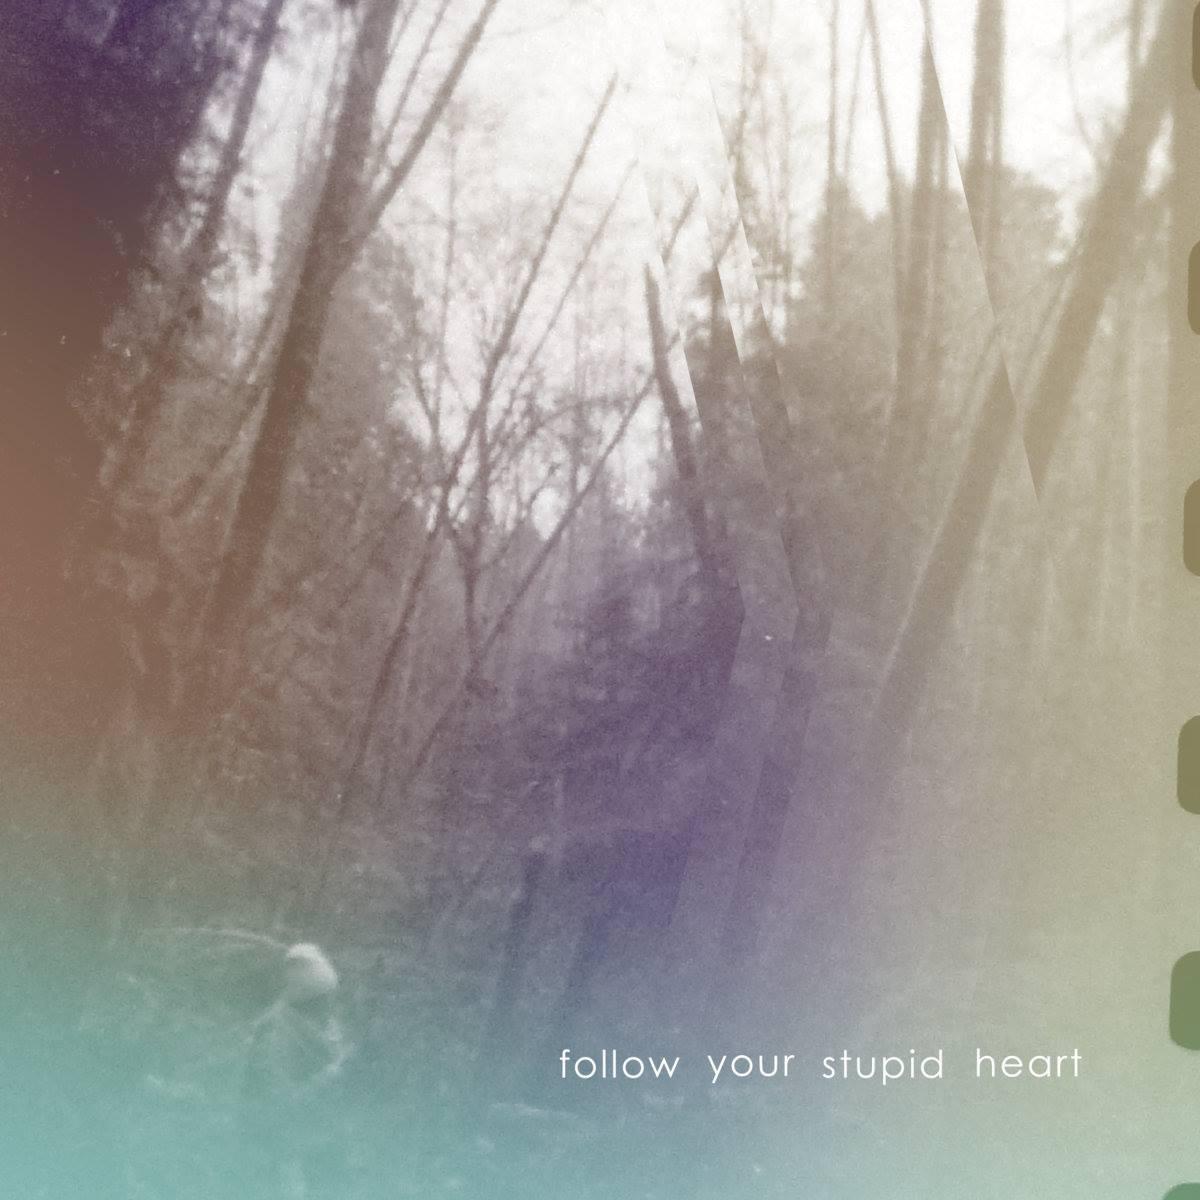 Follow Your Stupid Heart Album Art